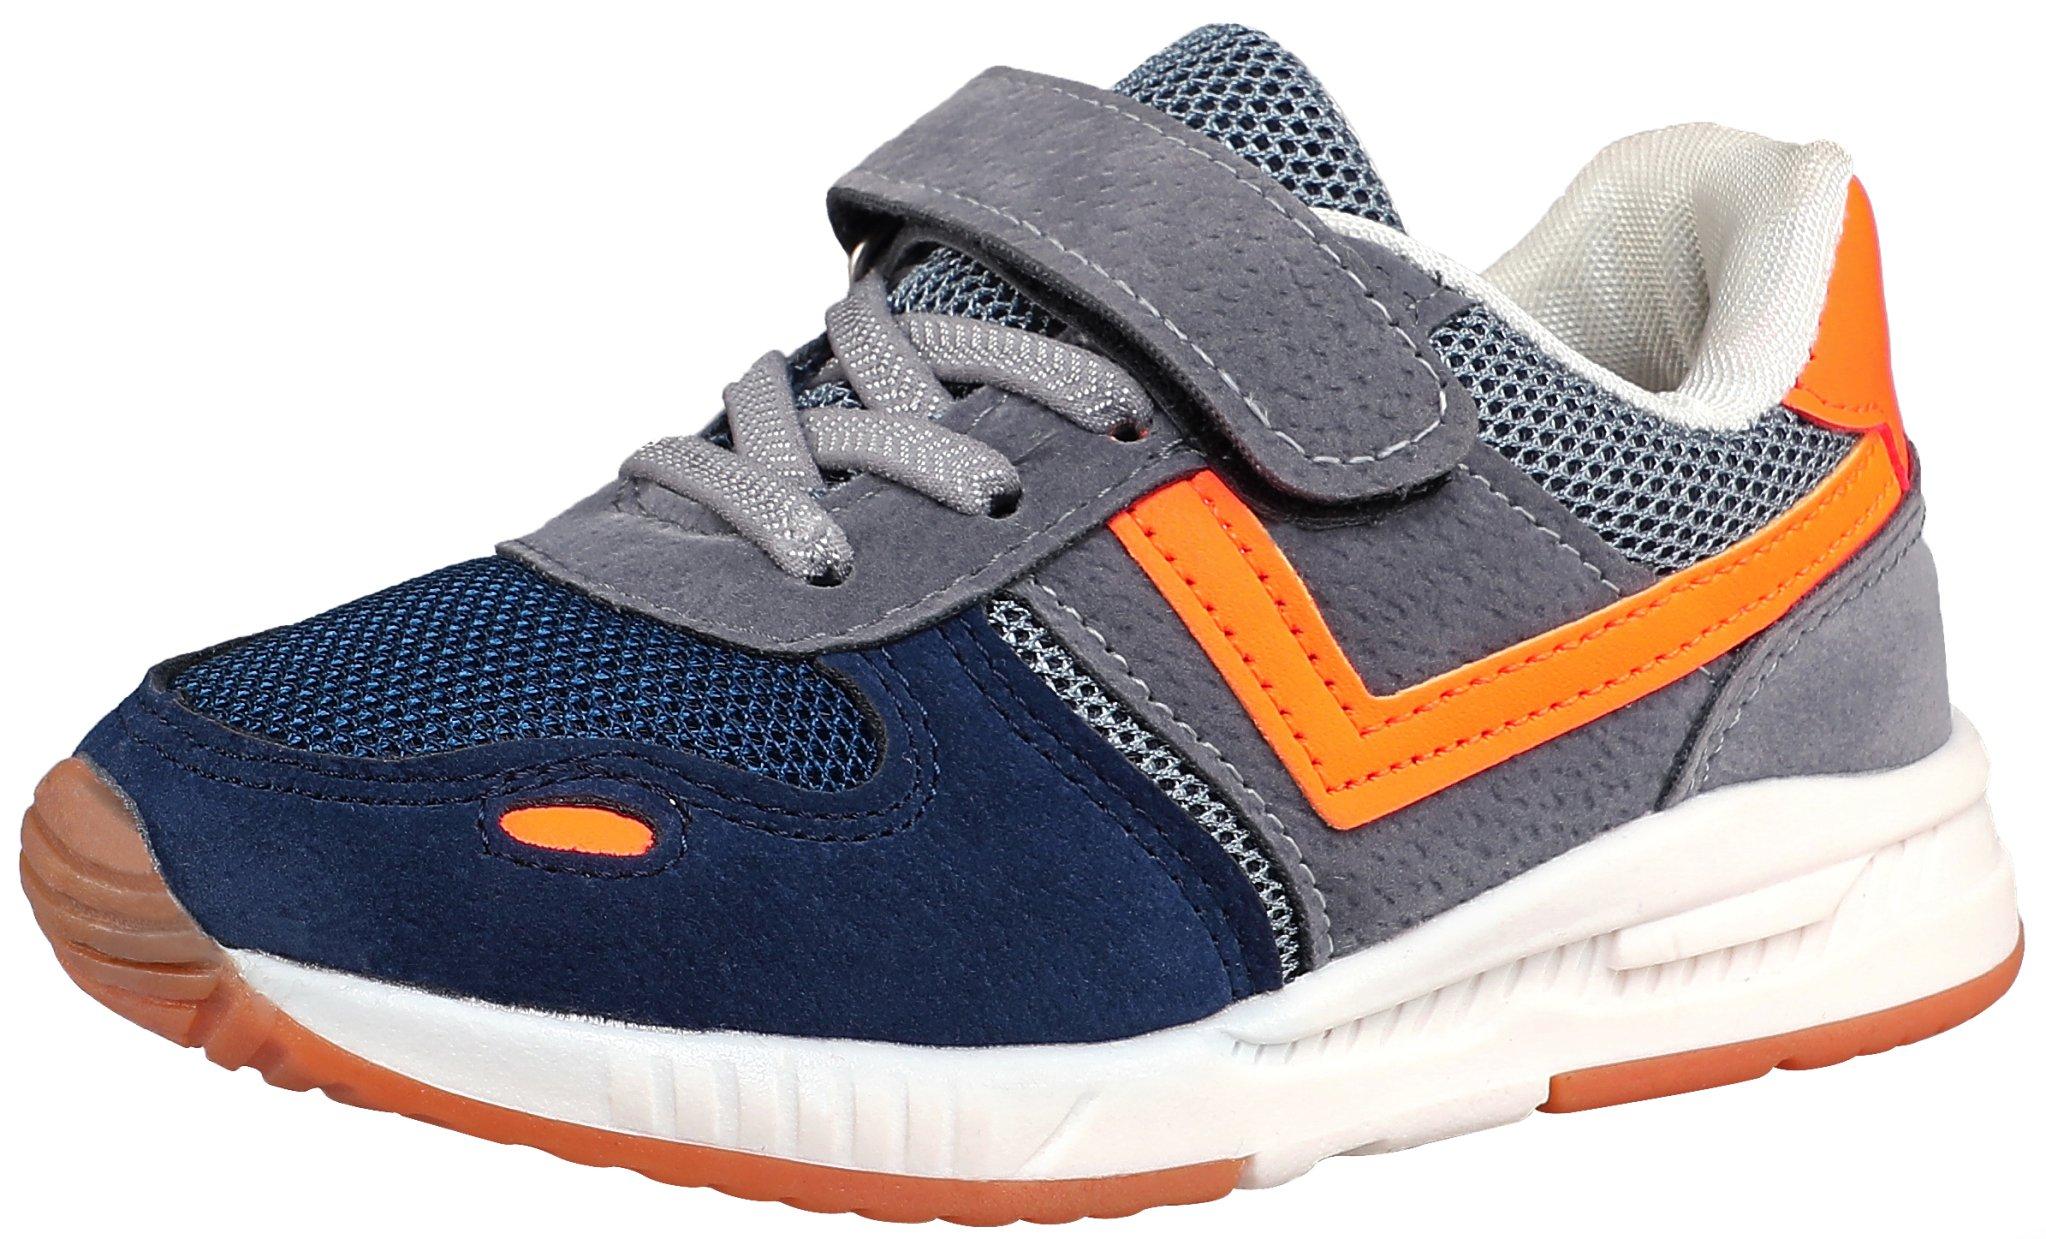 SKOEX Kid's Lightweight Sneakers Boys Girls Casual Sport Running Walking Shoes (Toddler/Little Kid) US Size 11 Grey